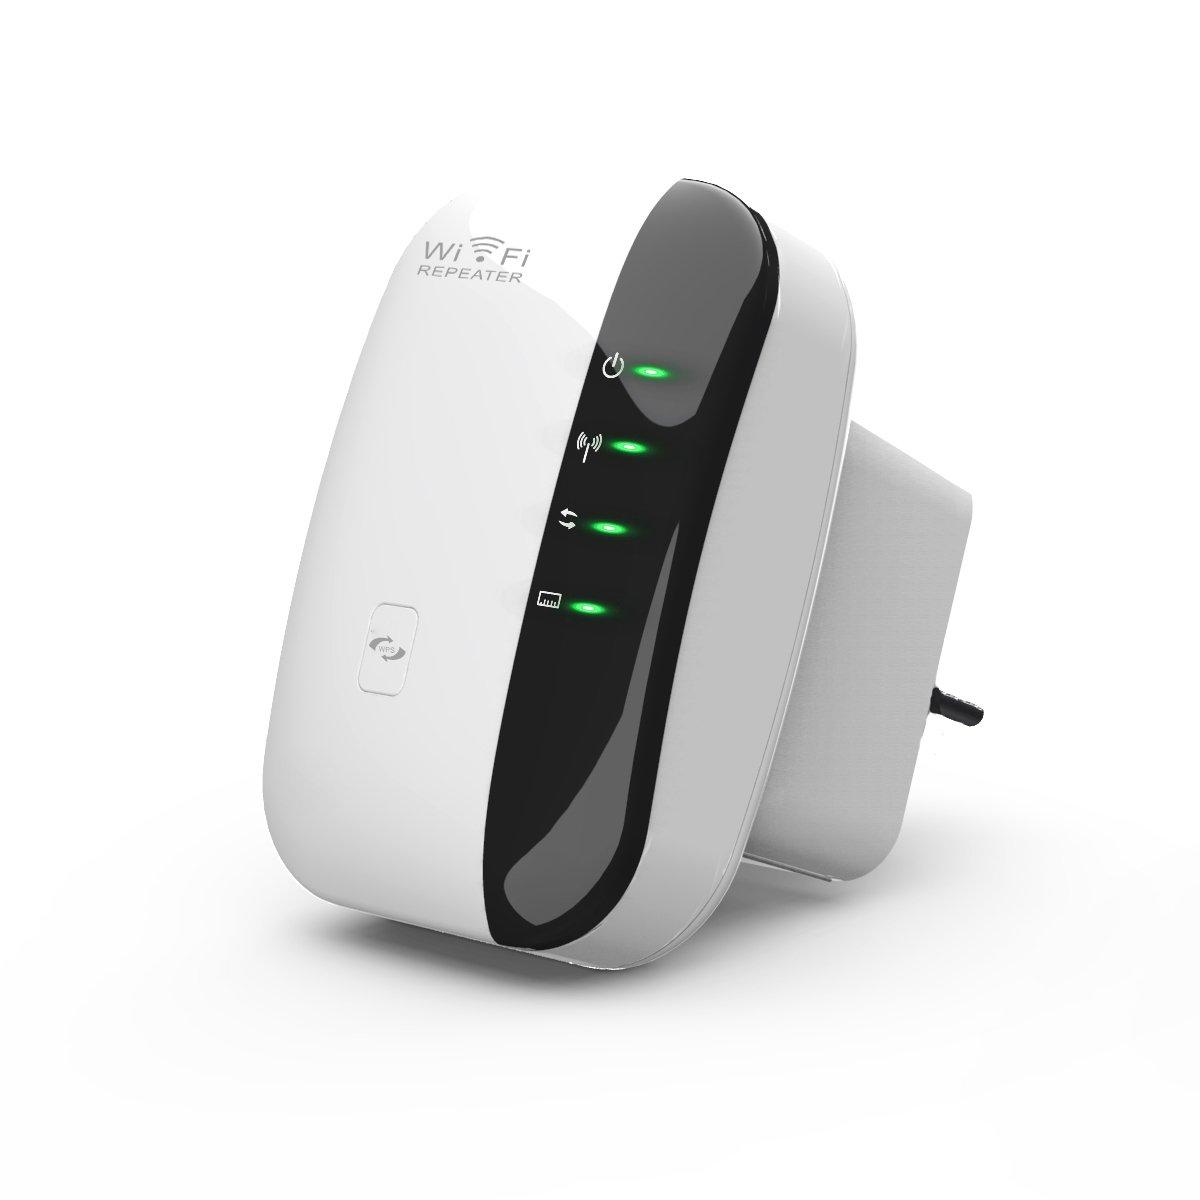 TeckNet 300Mbps WLAN Repeater, WiFi Repeater,